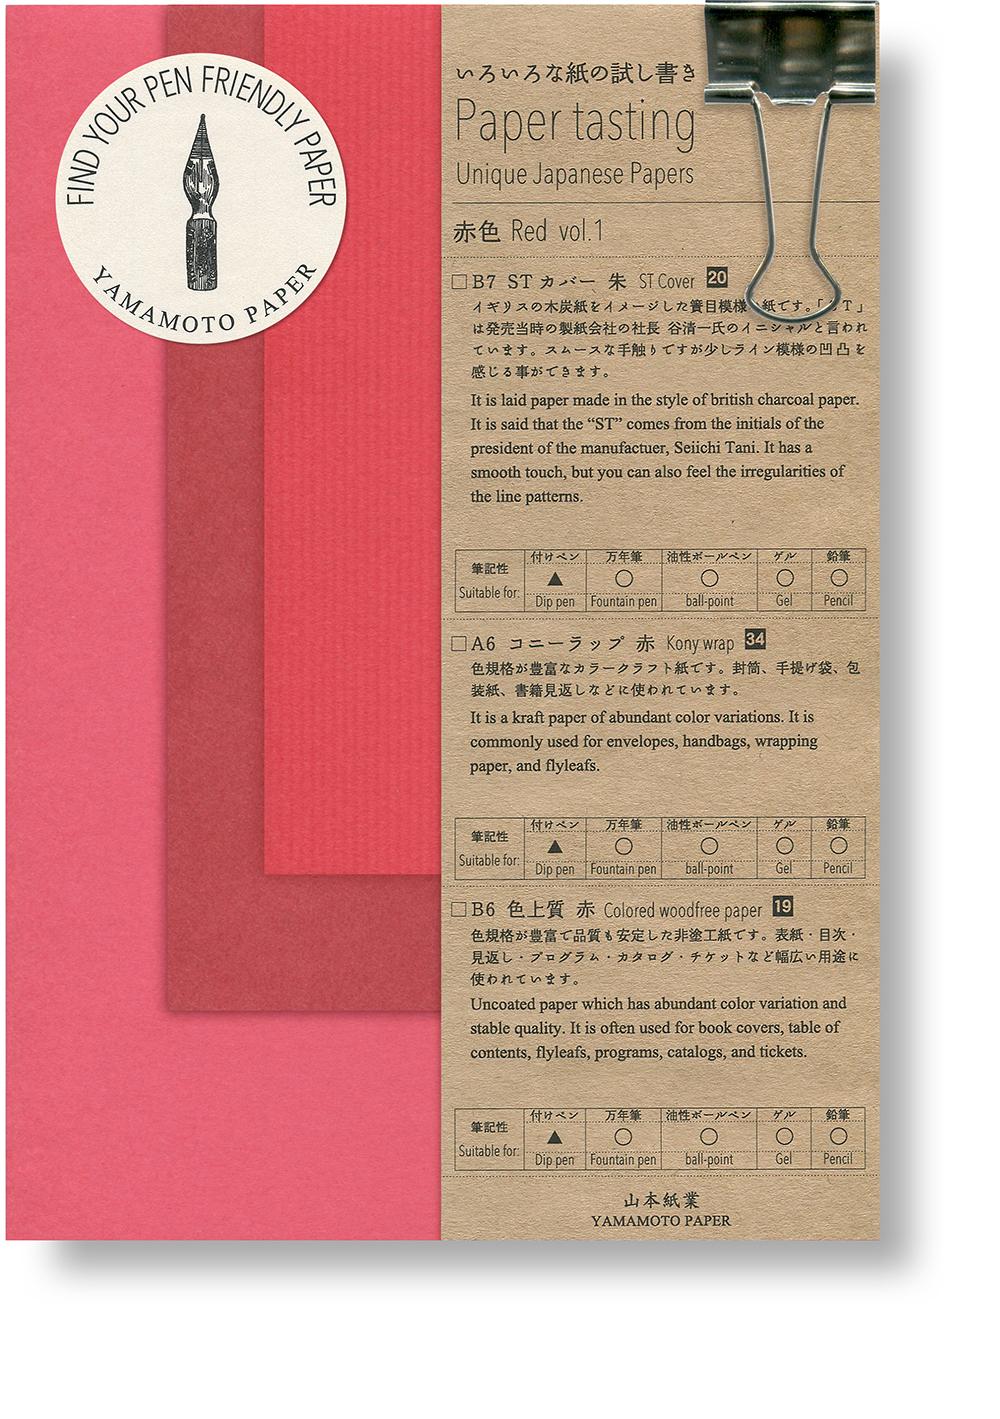 Paper tasting 赤色 Red Vol.1